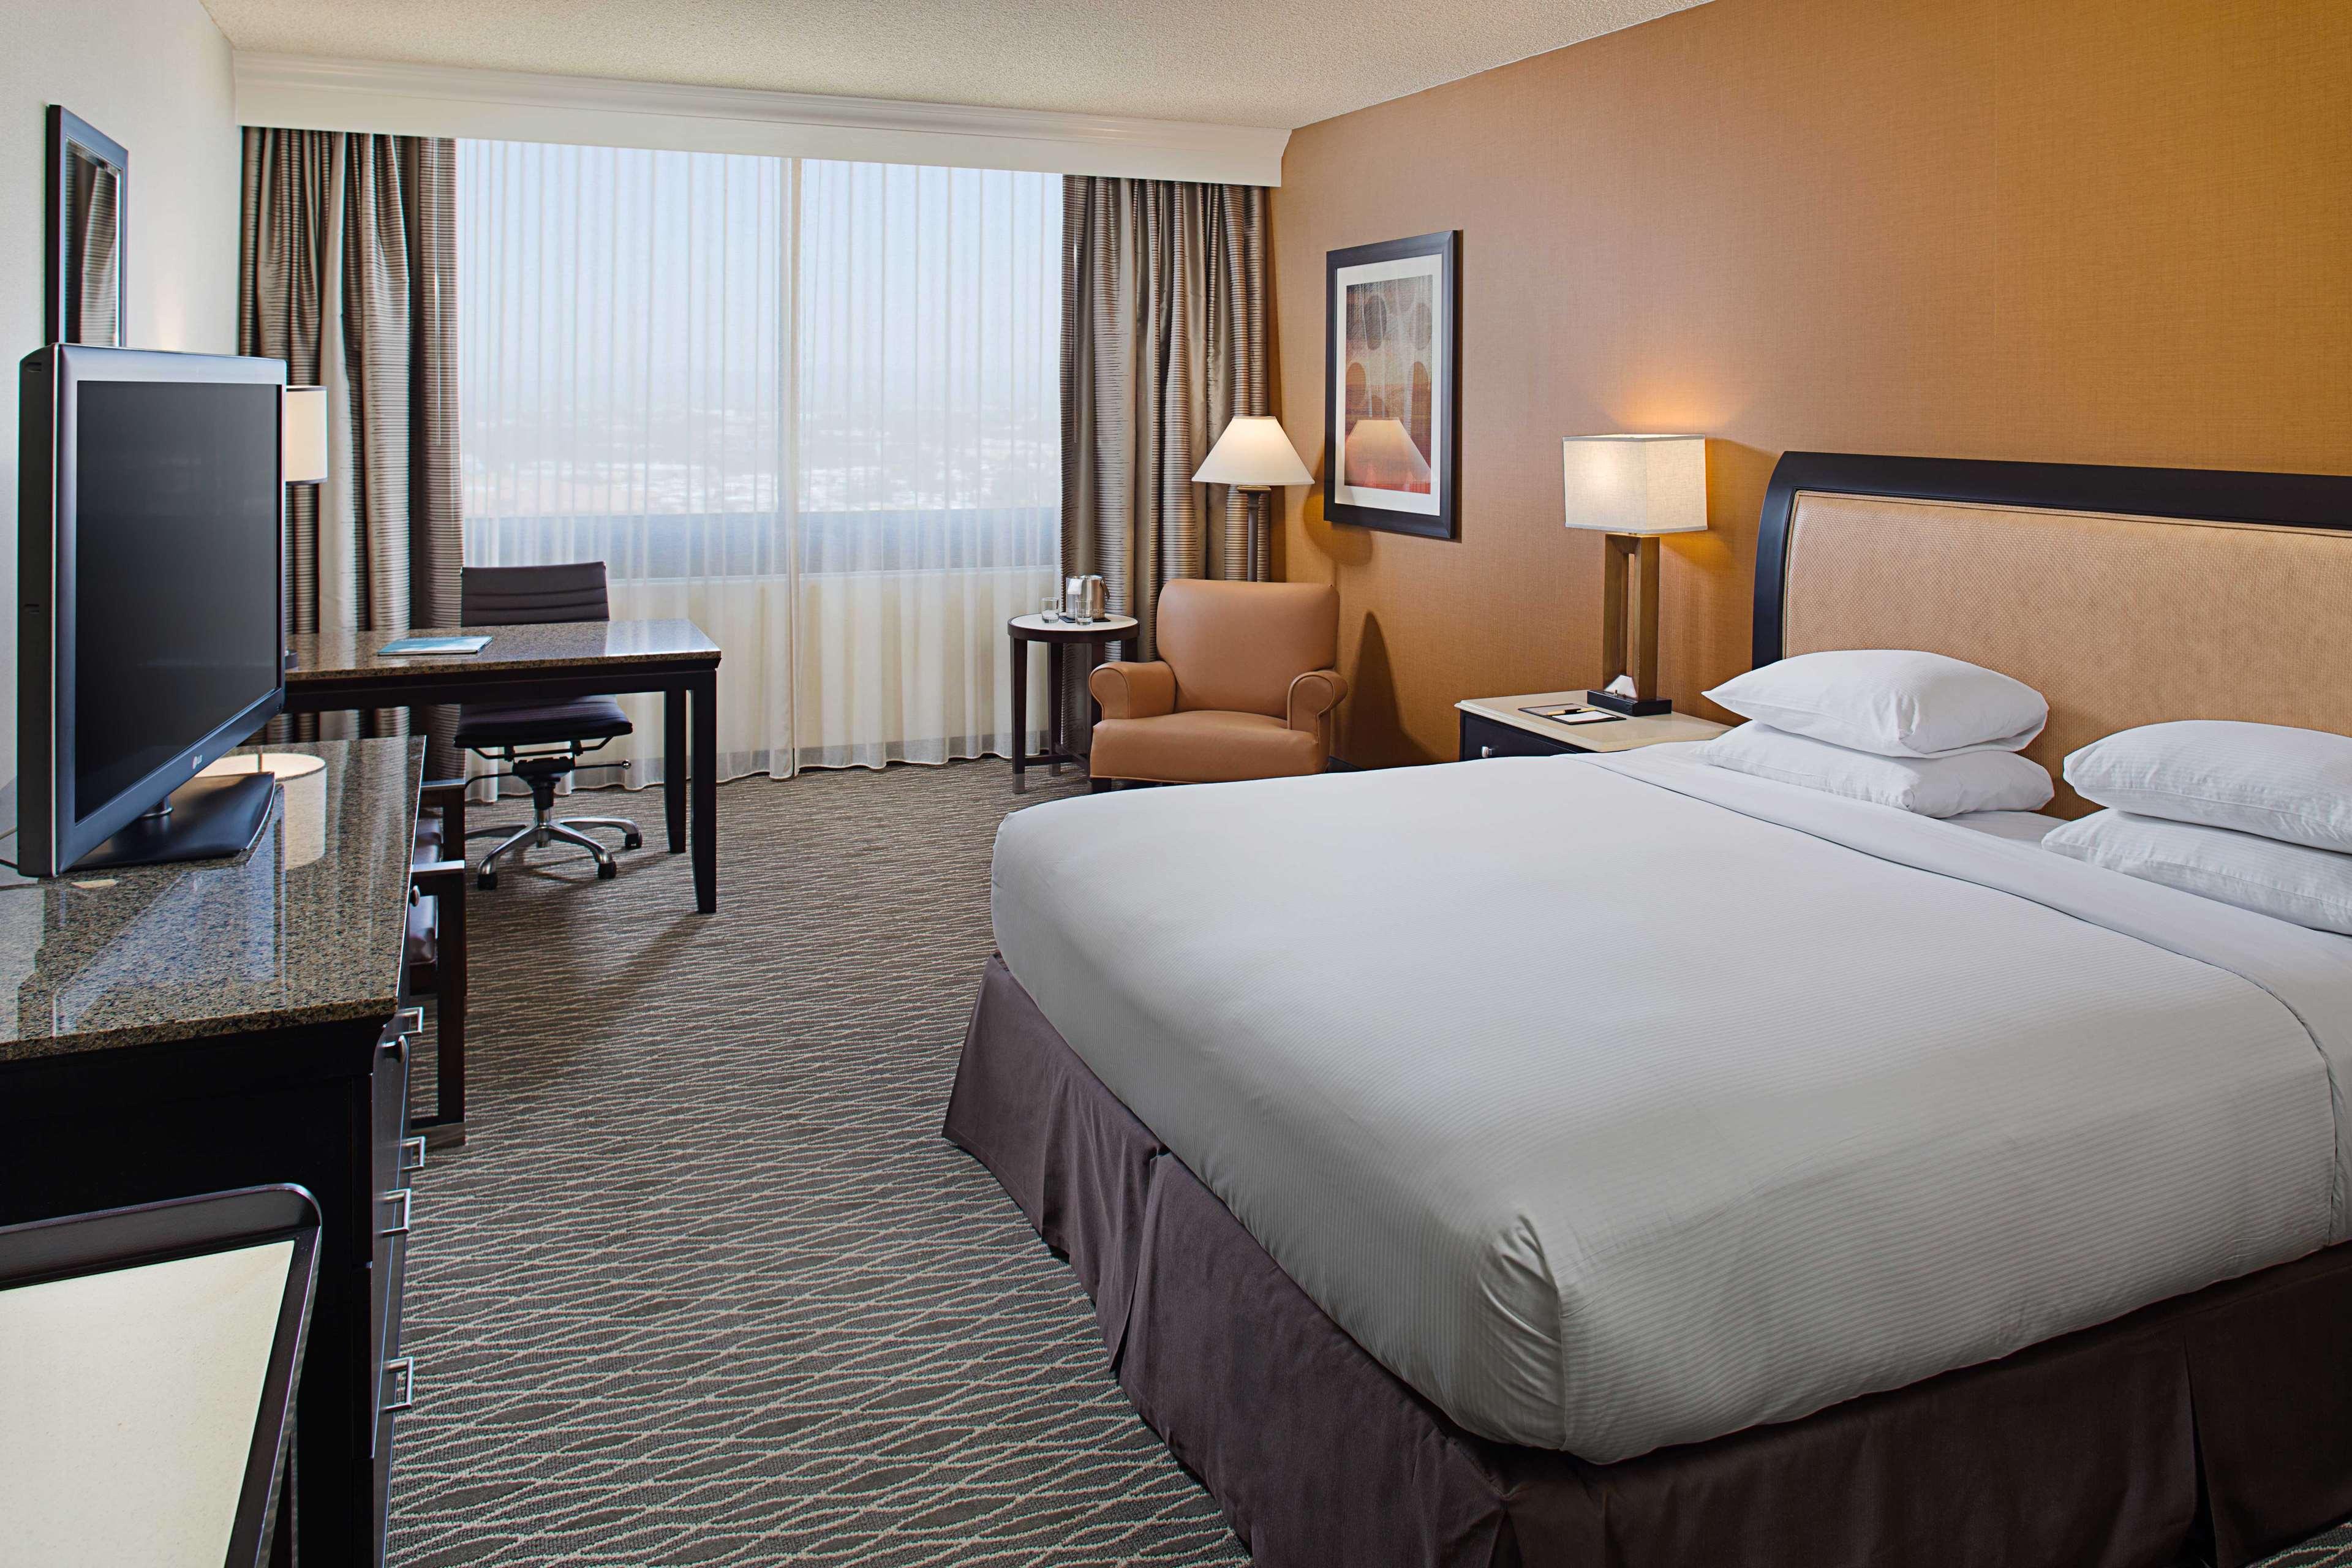 DoubleTree by Hilton Hotel Anaheim - Orange County image 38